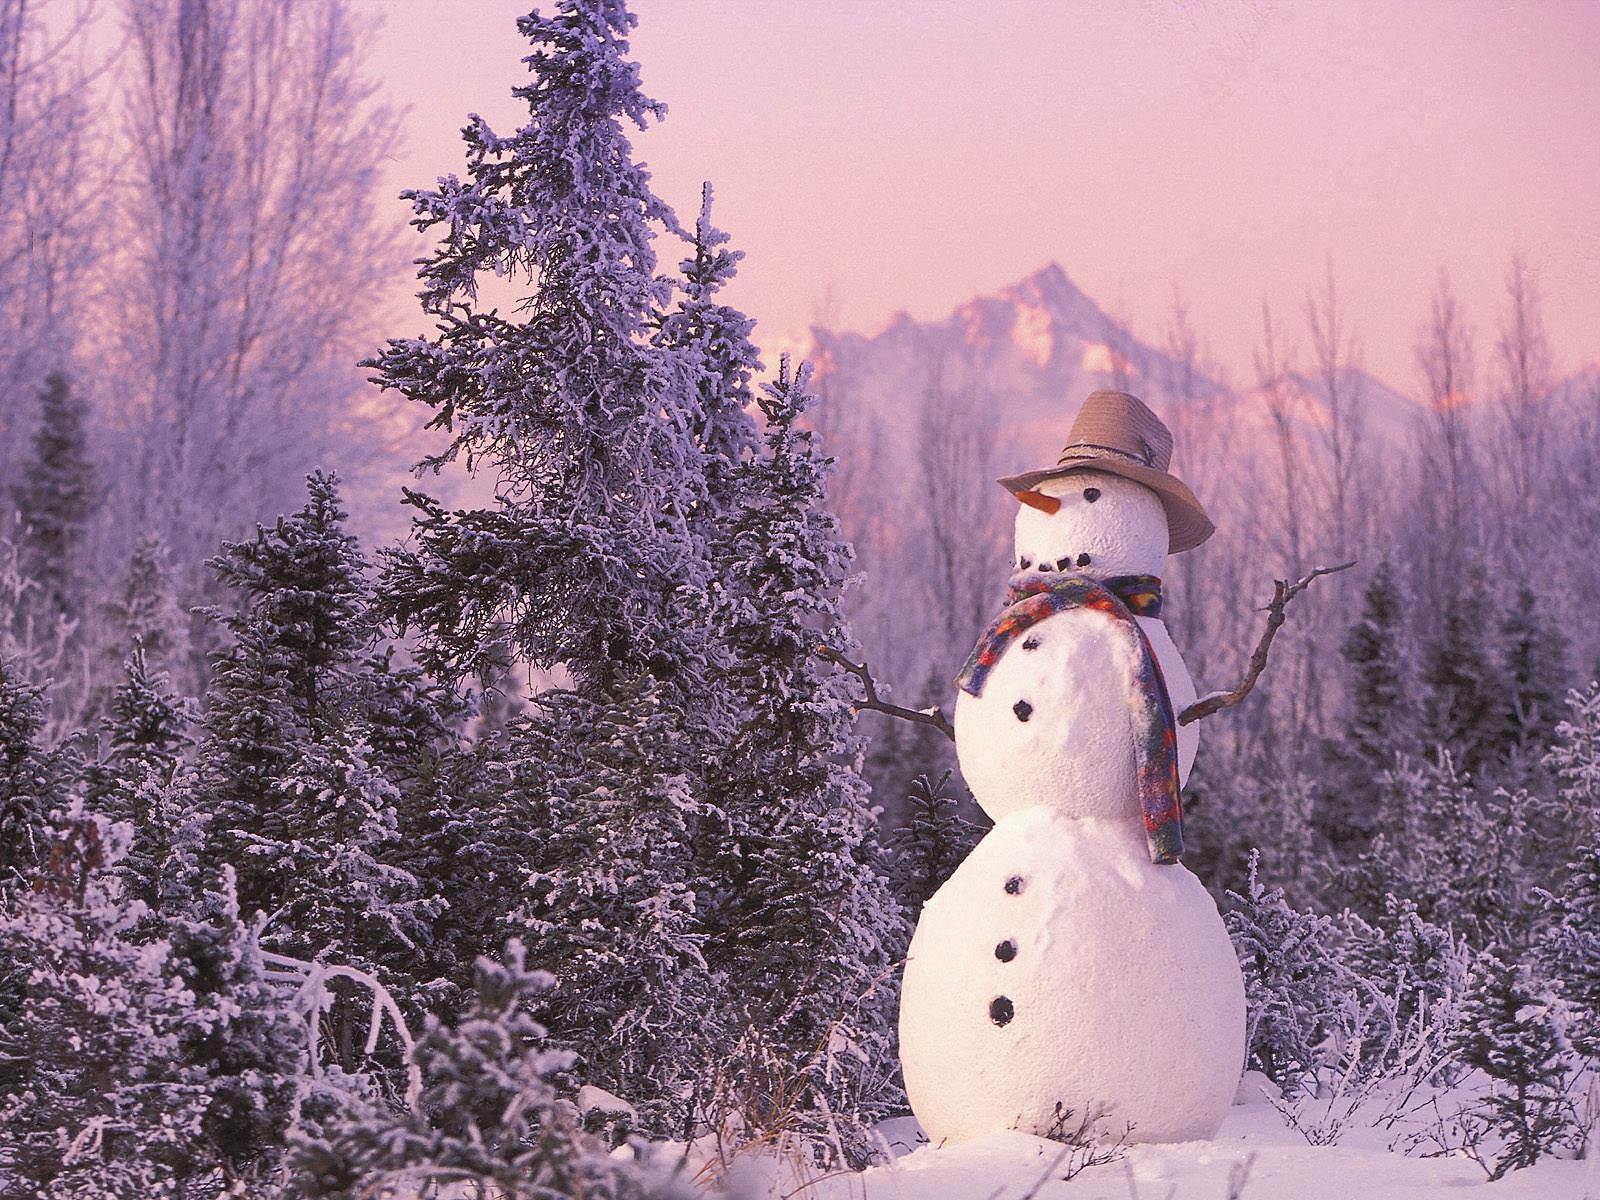 Gallery Mangklex Snowman Desktop Wallpapers And Backgrounds